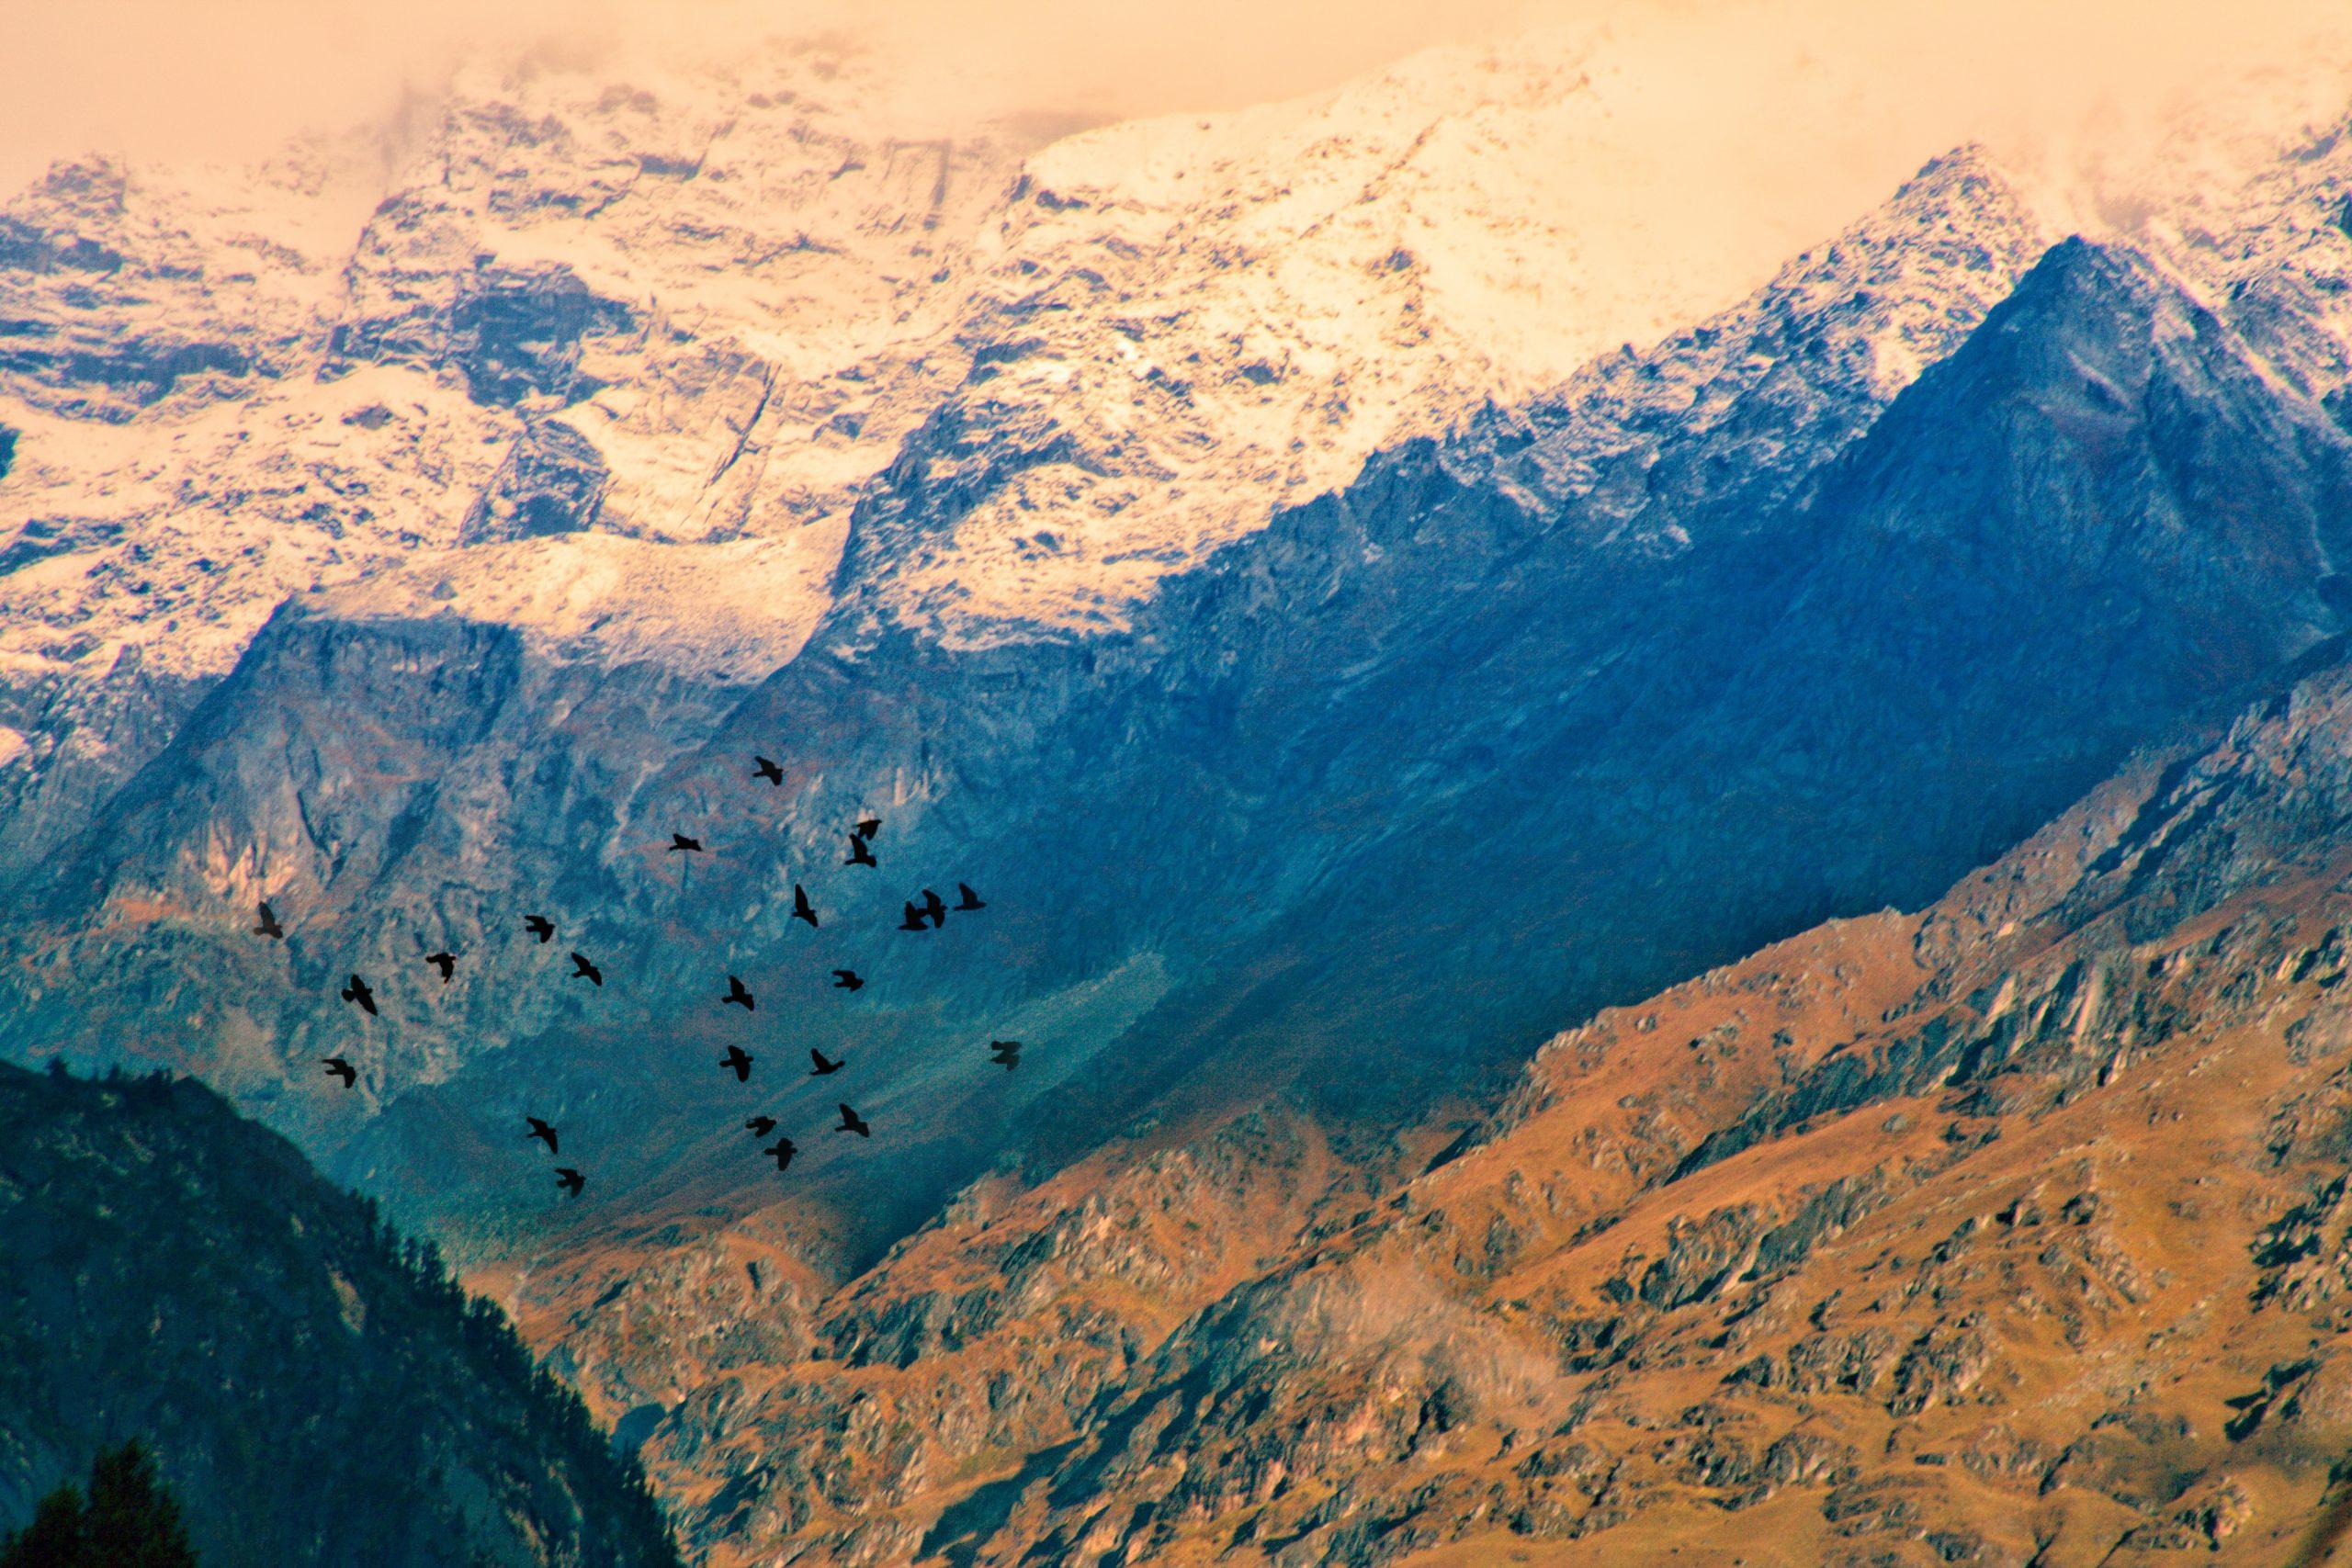 Birds flying around mountains